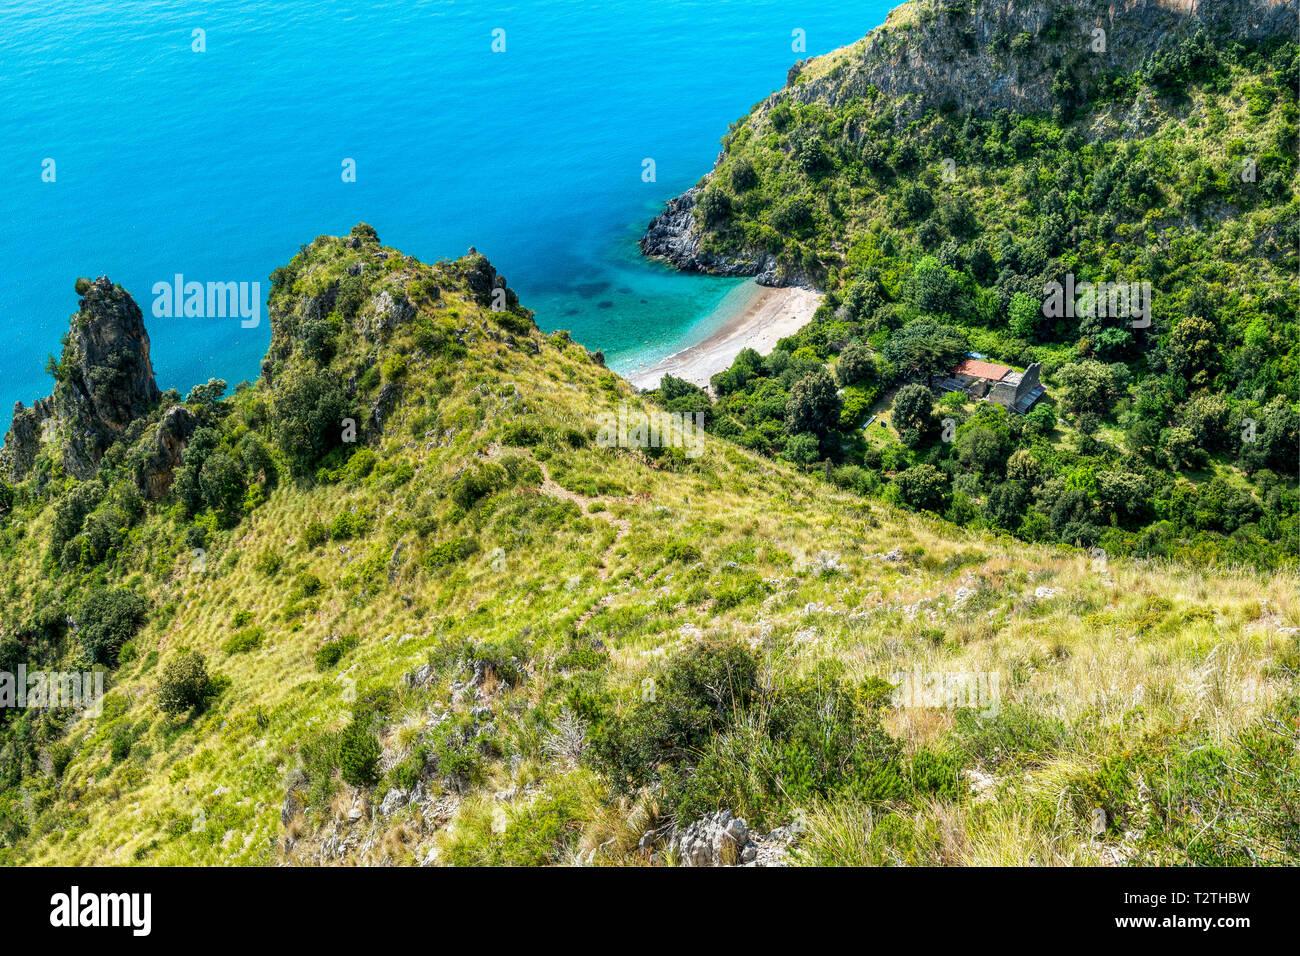 Italy, Campania, Cilento National Park, Masseta and Infreschi Marine protected area, sea cliff, Marcellino beach and gorge - Stock Image